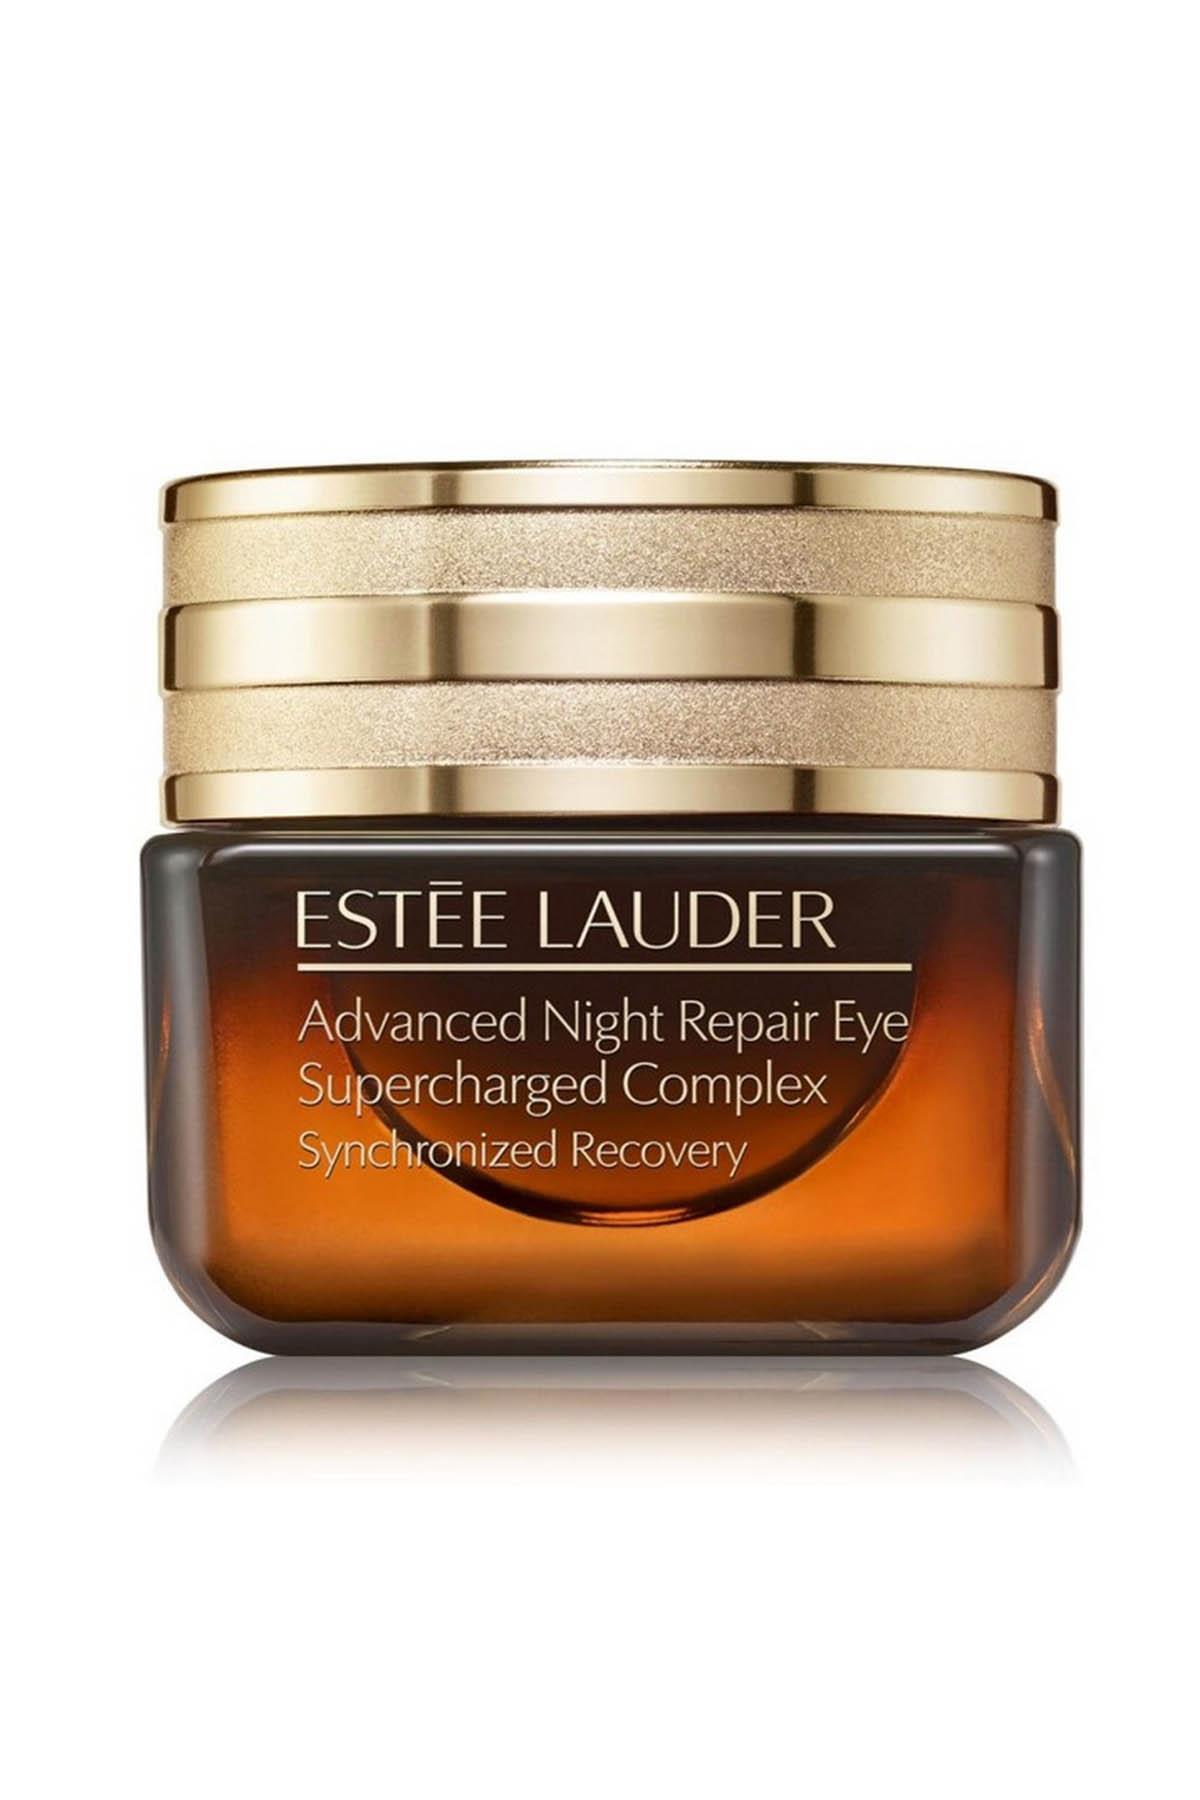 Estee Lauder Advanced Night Repair Eye Complex 15 ml